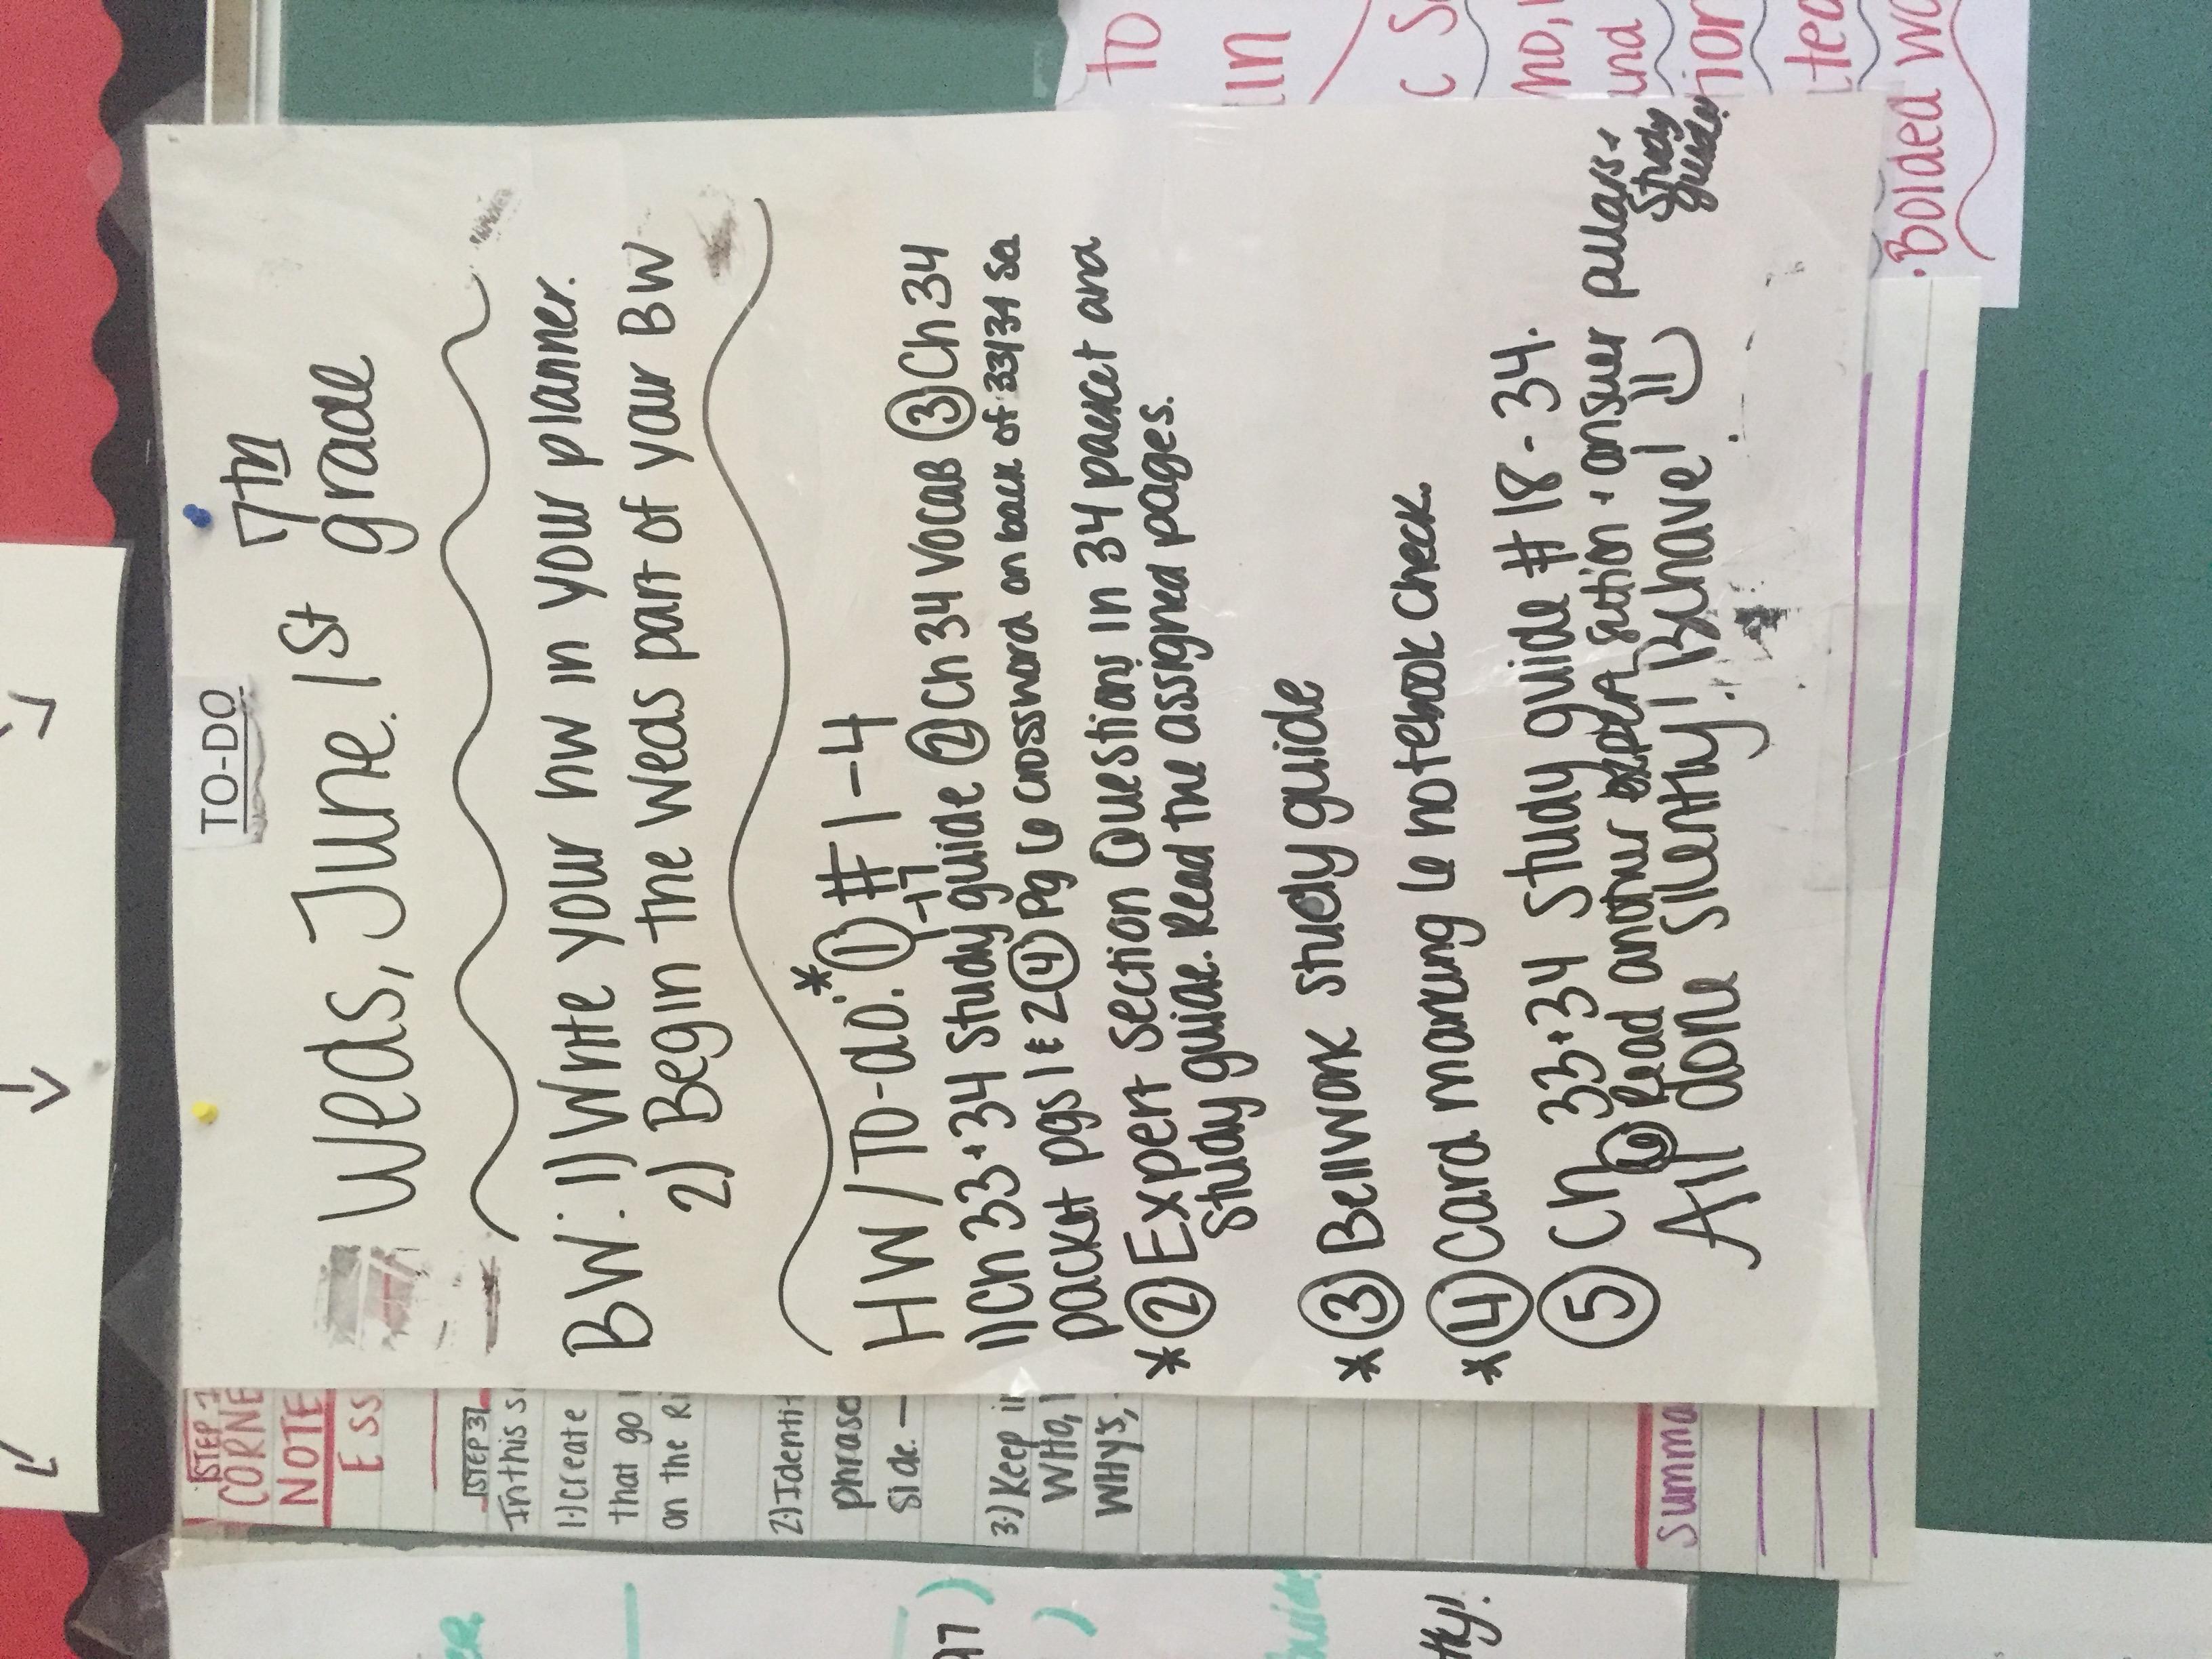 Ms Rancilio S Classroom Blog